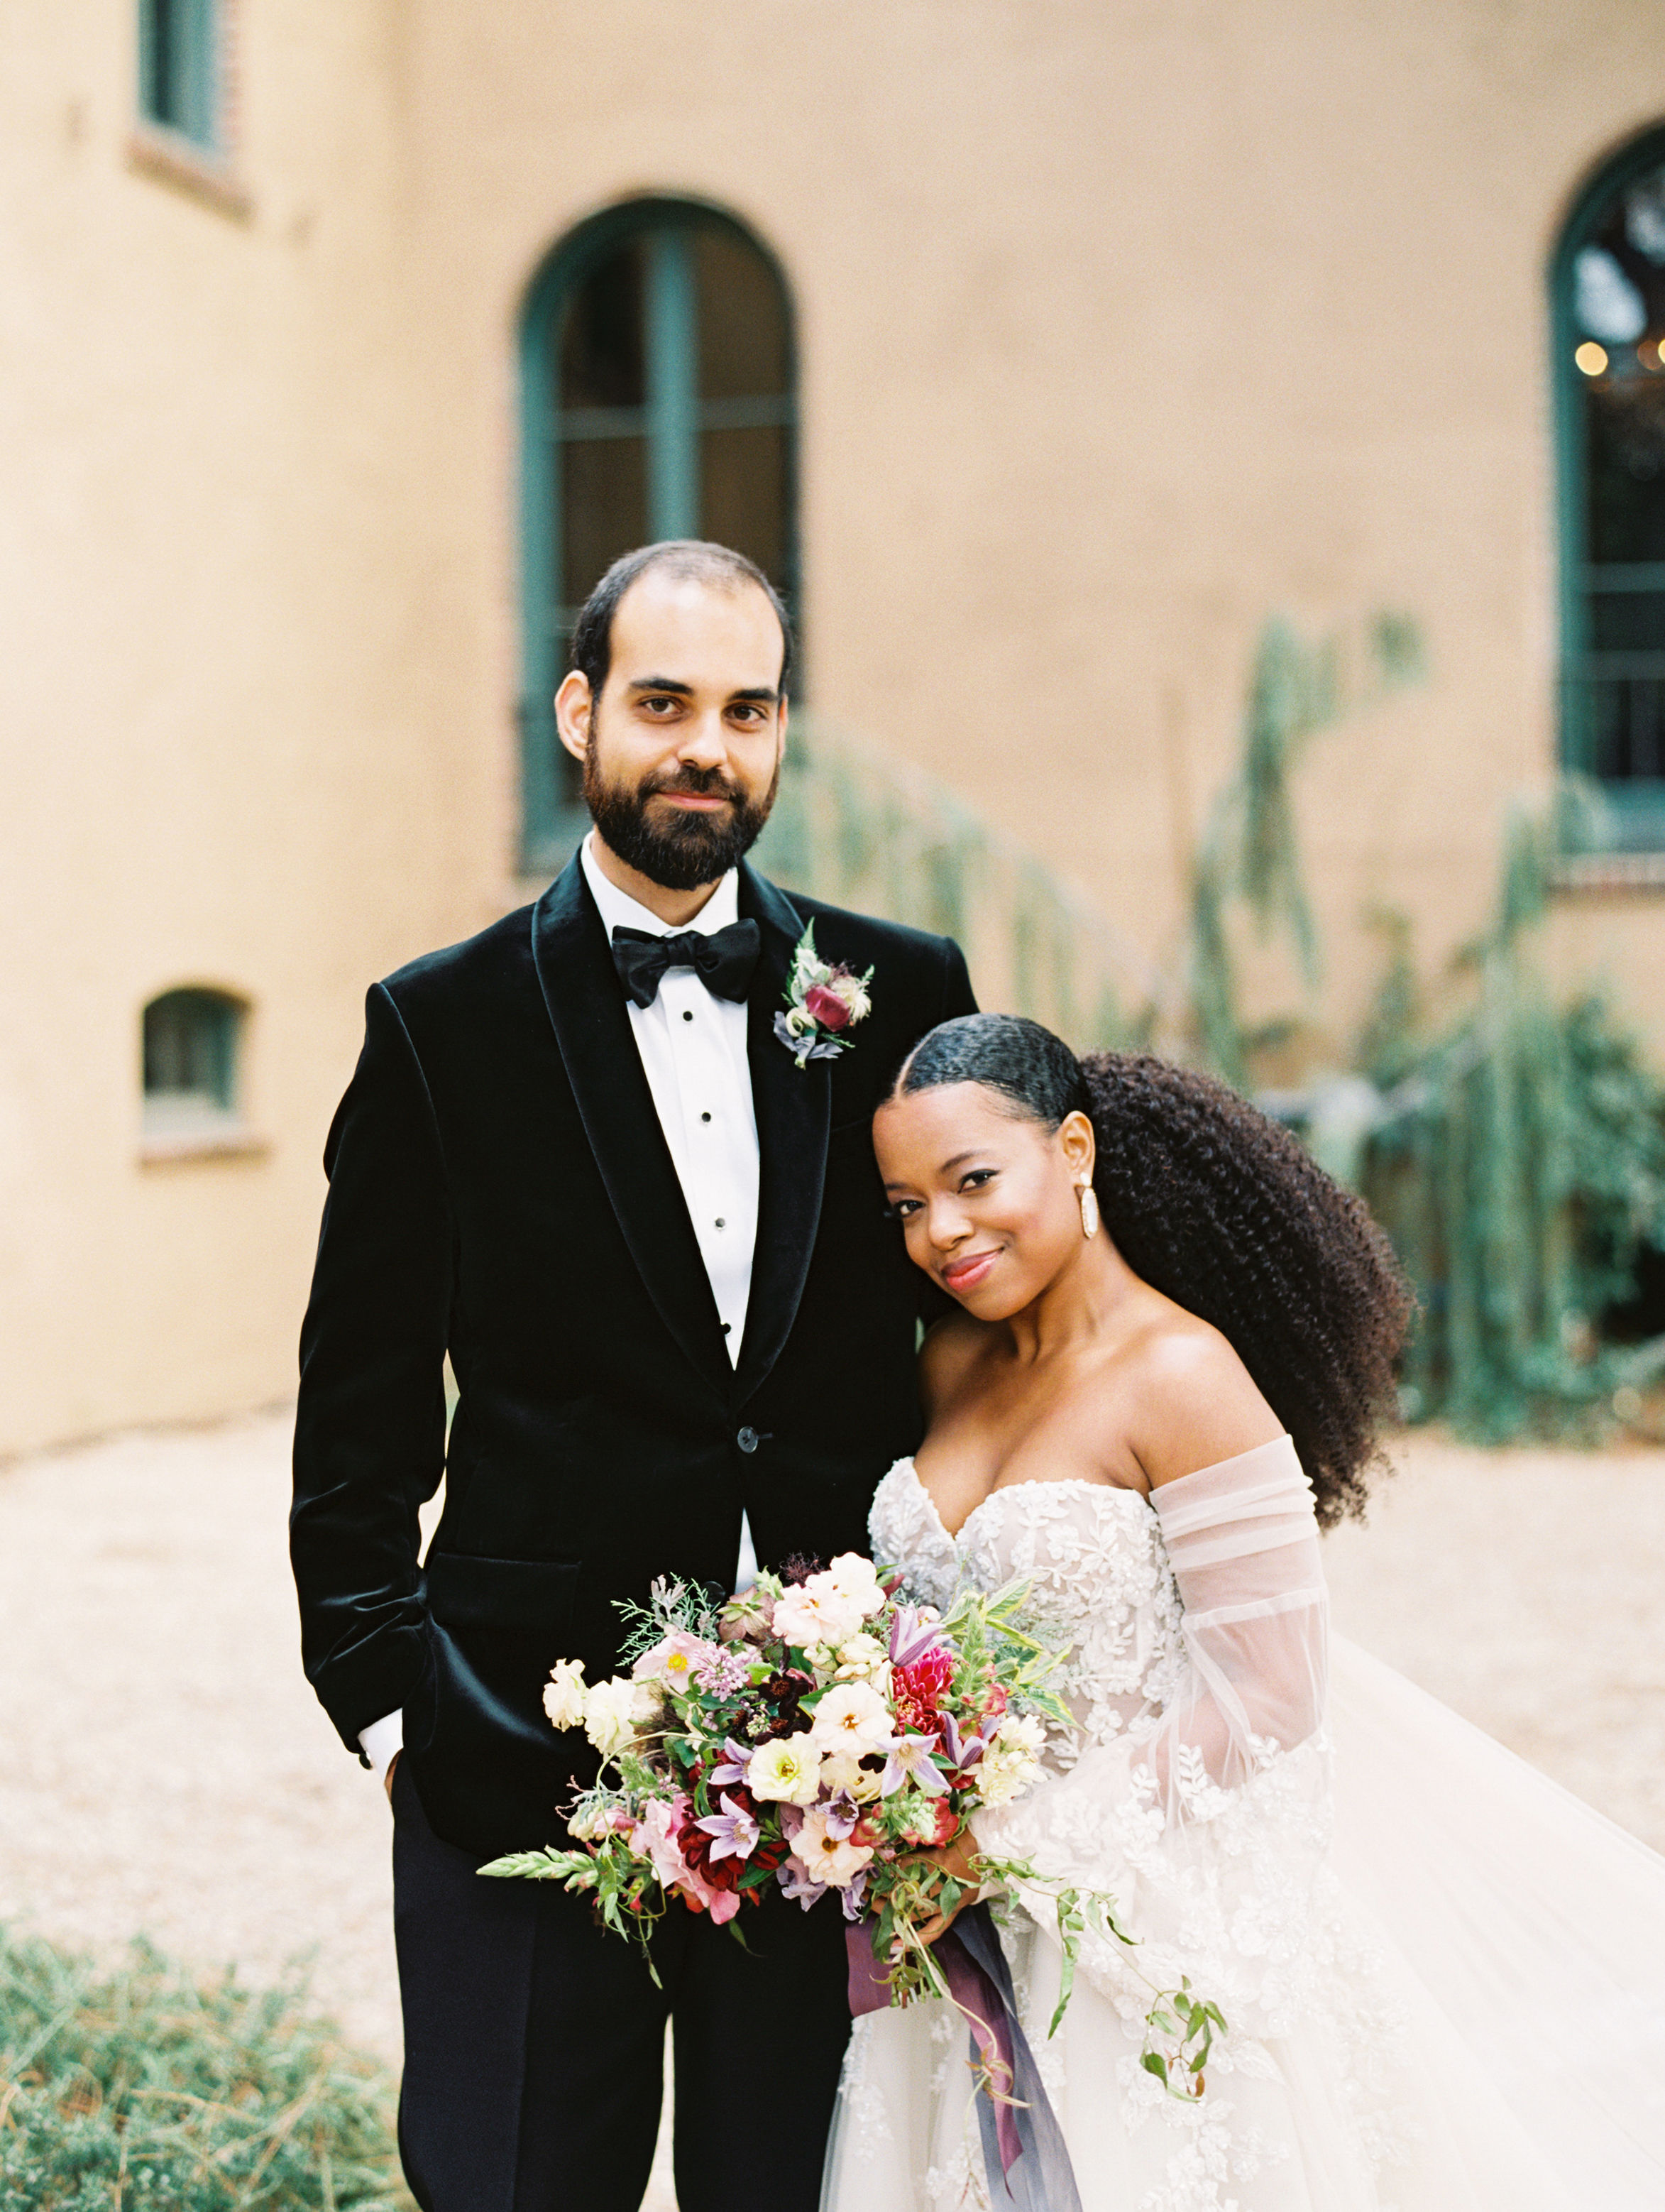 jamie and michael wedding couple